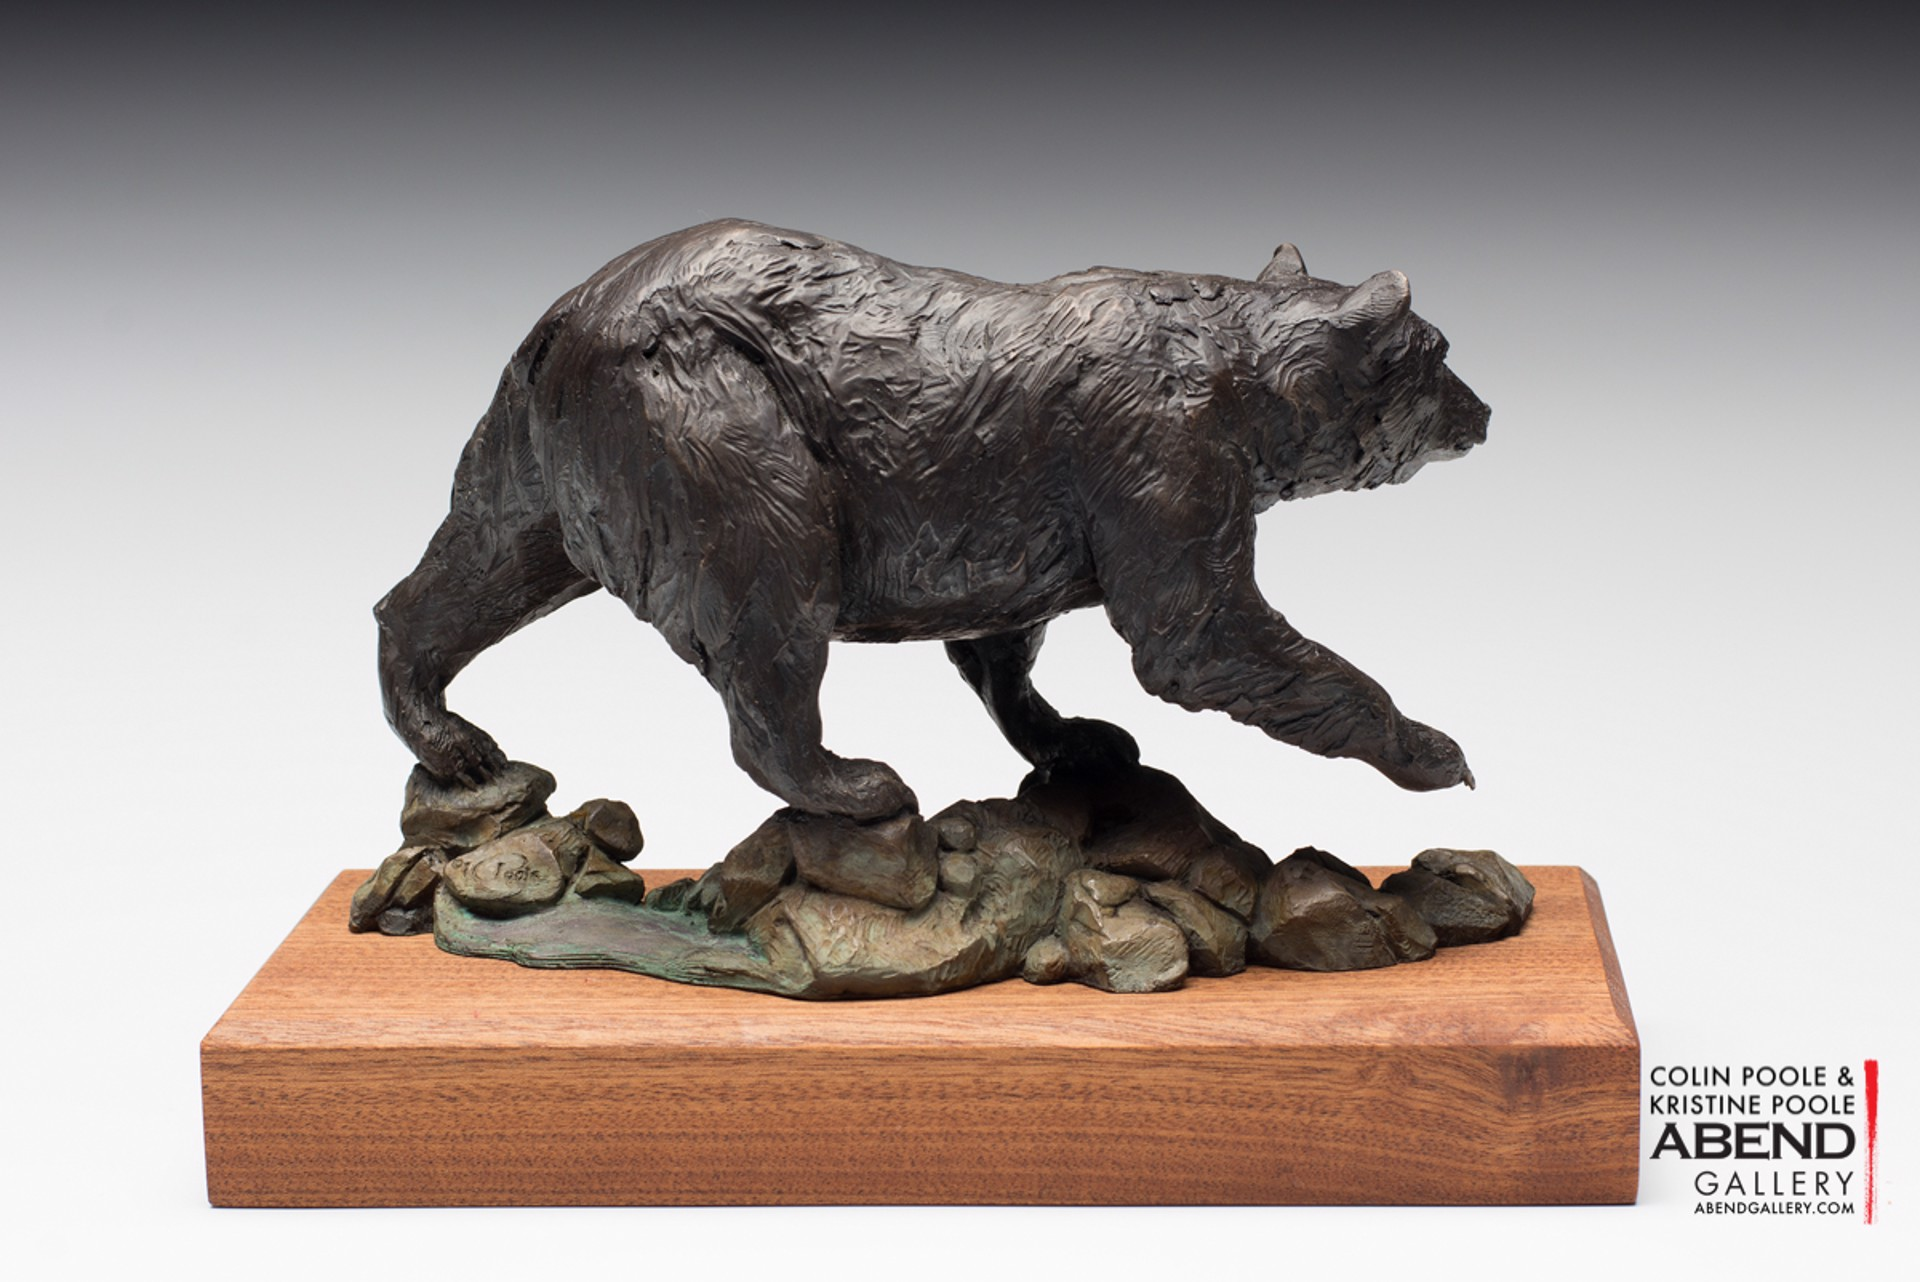 Black Bear by Colin & Kristine Poole